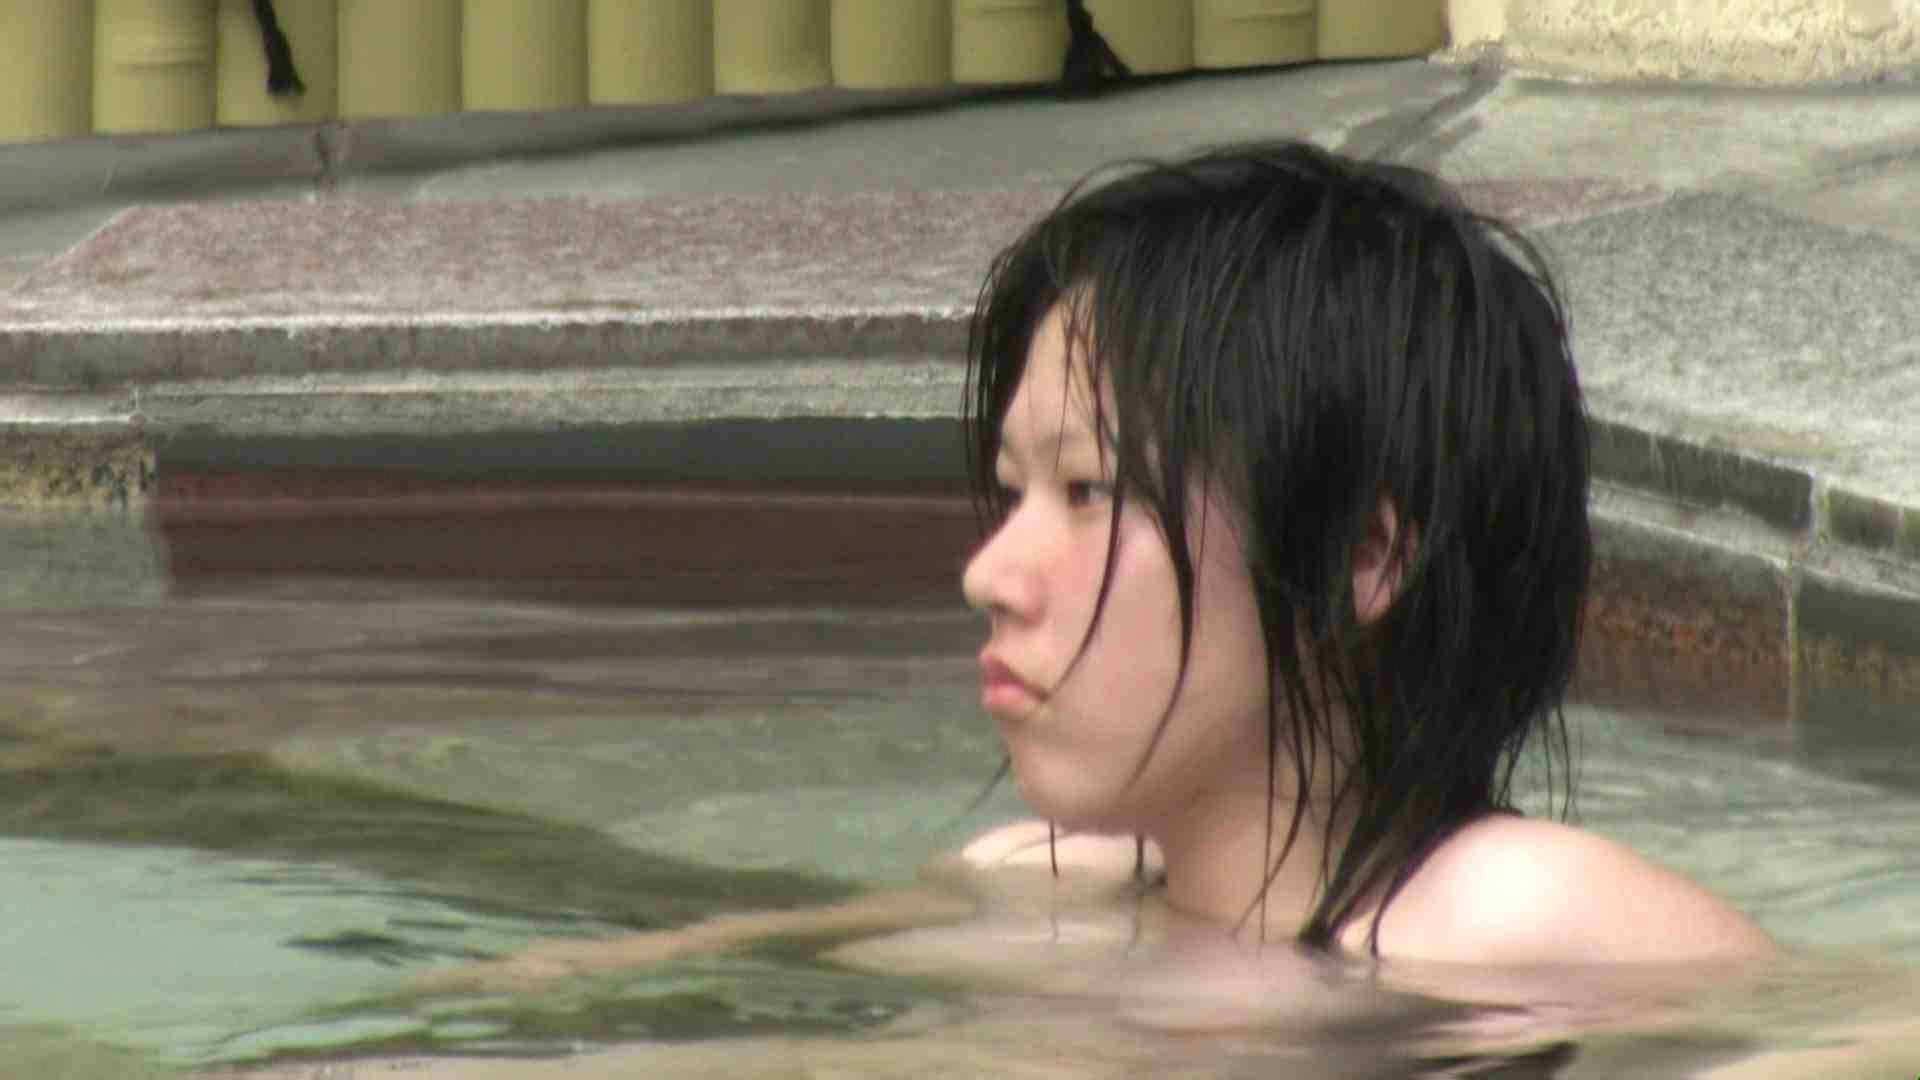 Aquaな露天風呂Vol.36 OL女体  78連発 72